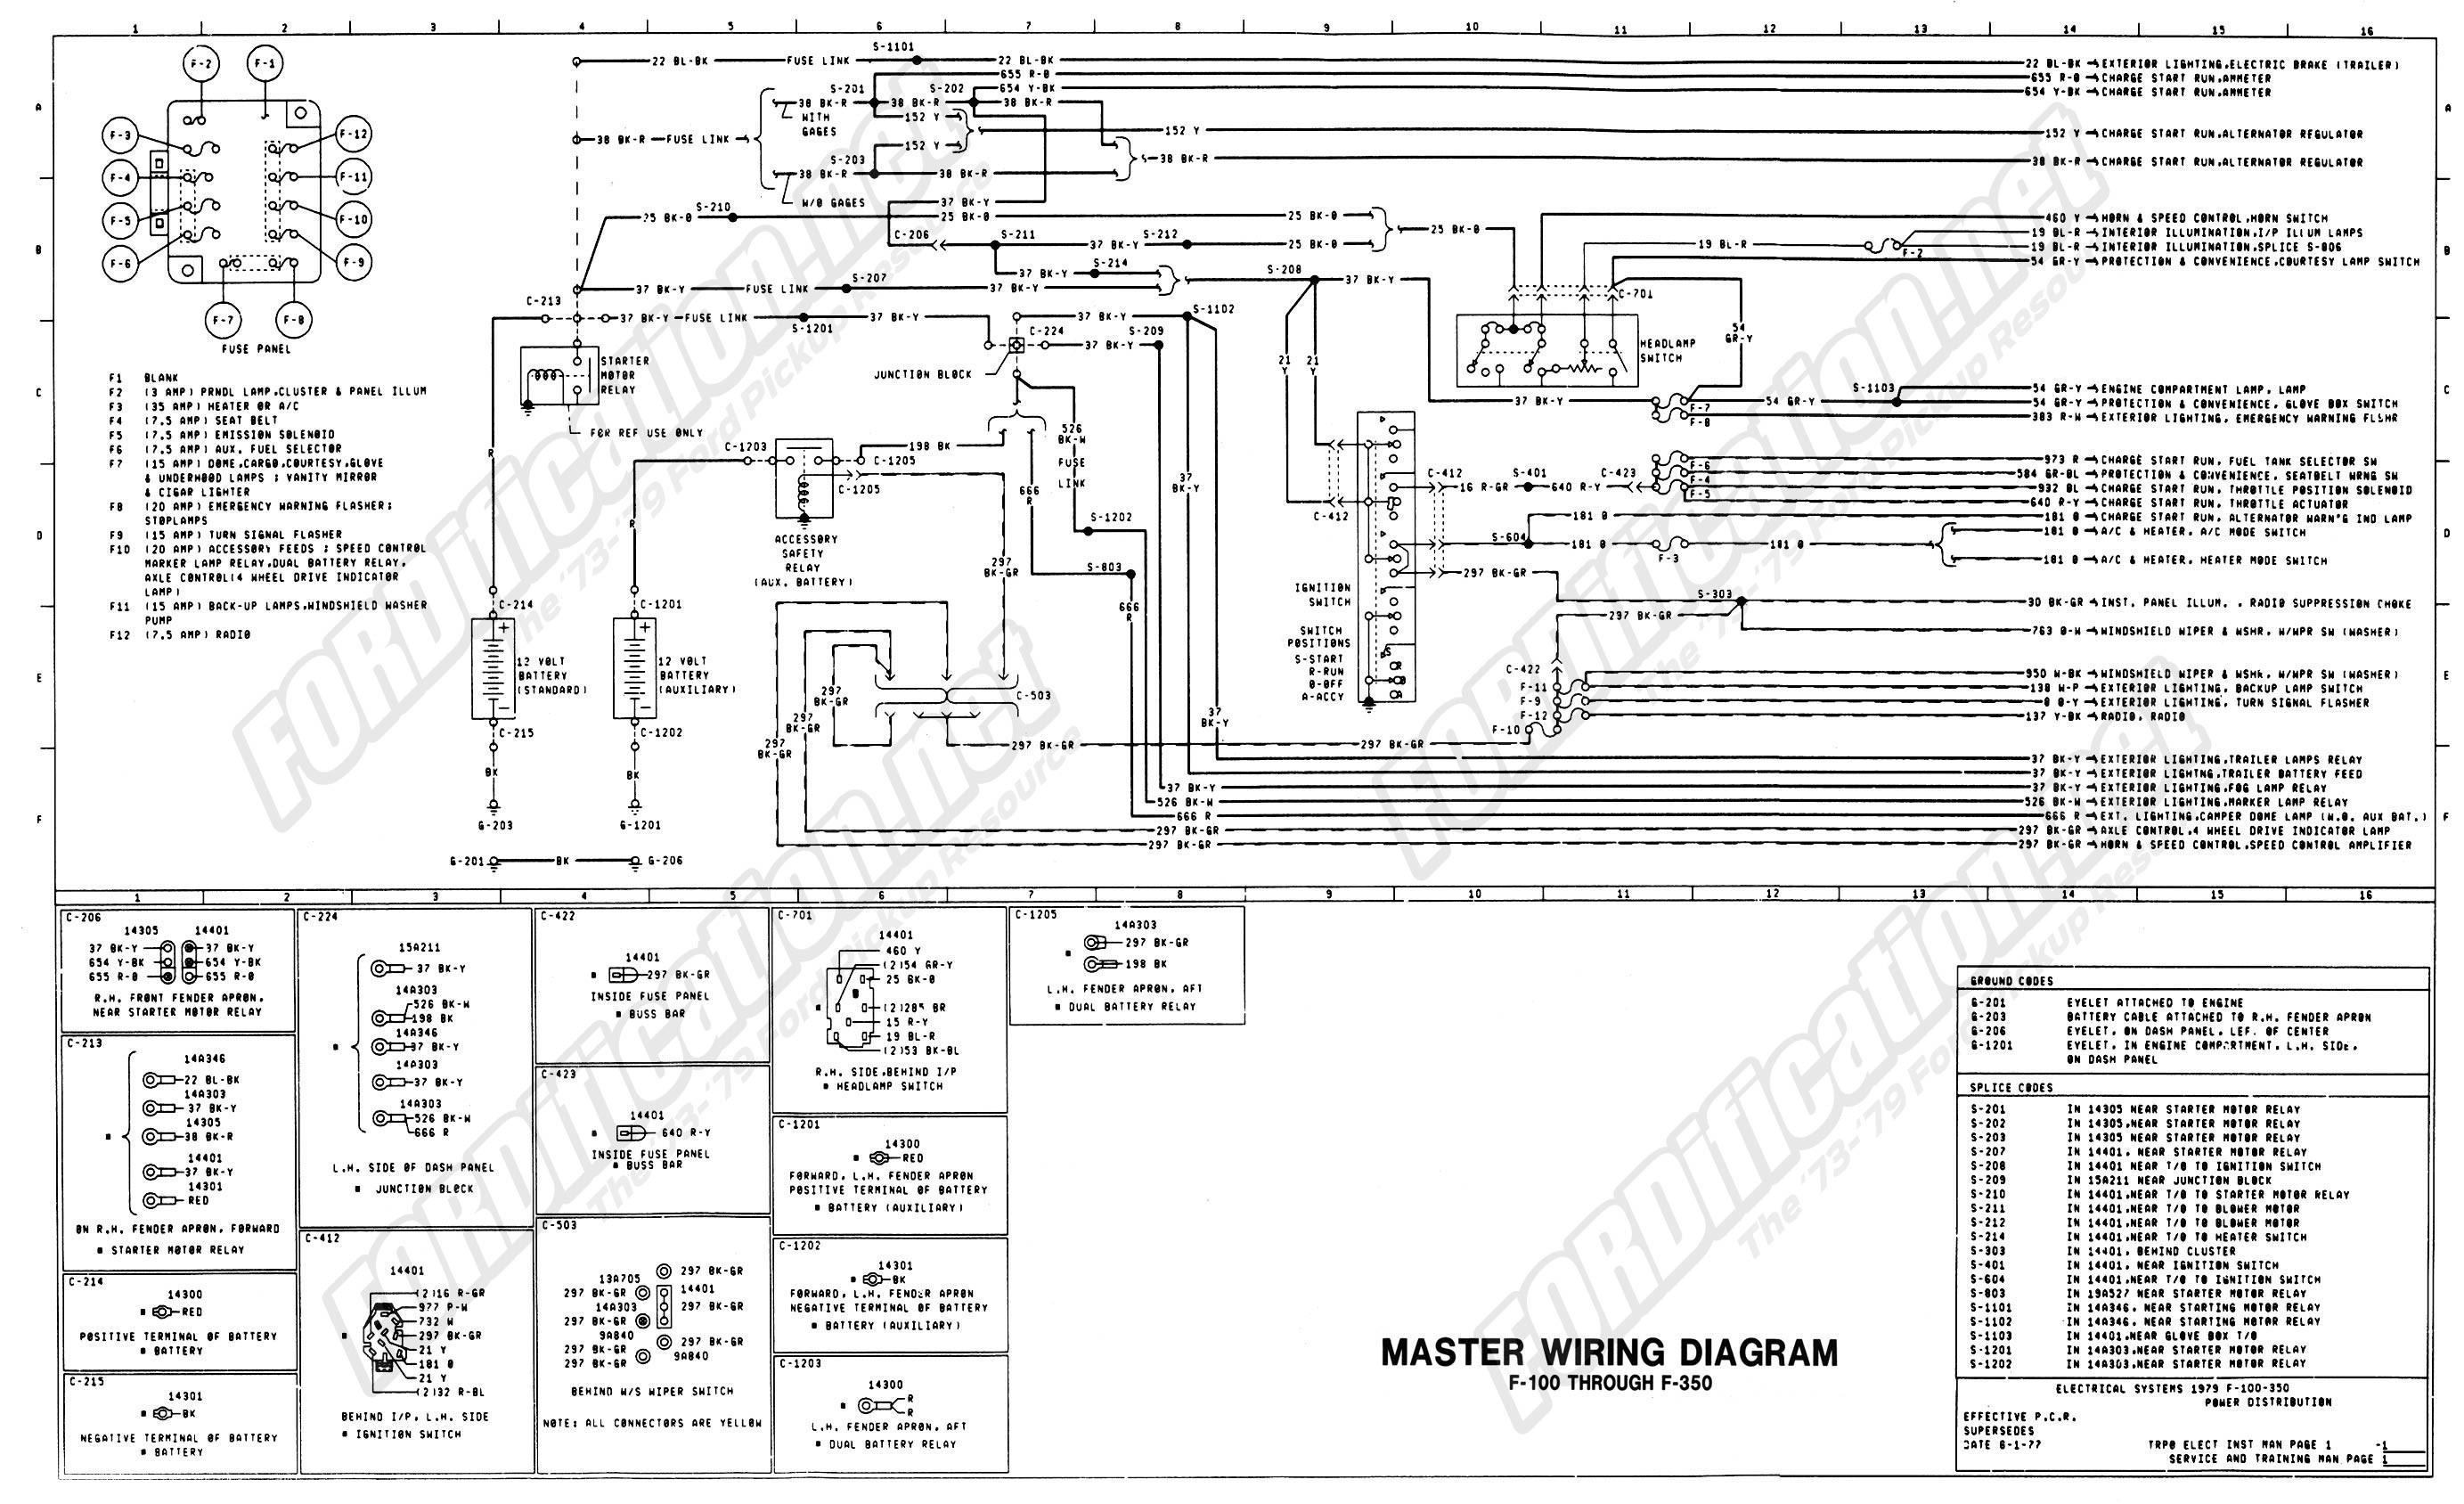 International Truck Wiring Diagram Unique | Wiring Diagram Image